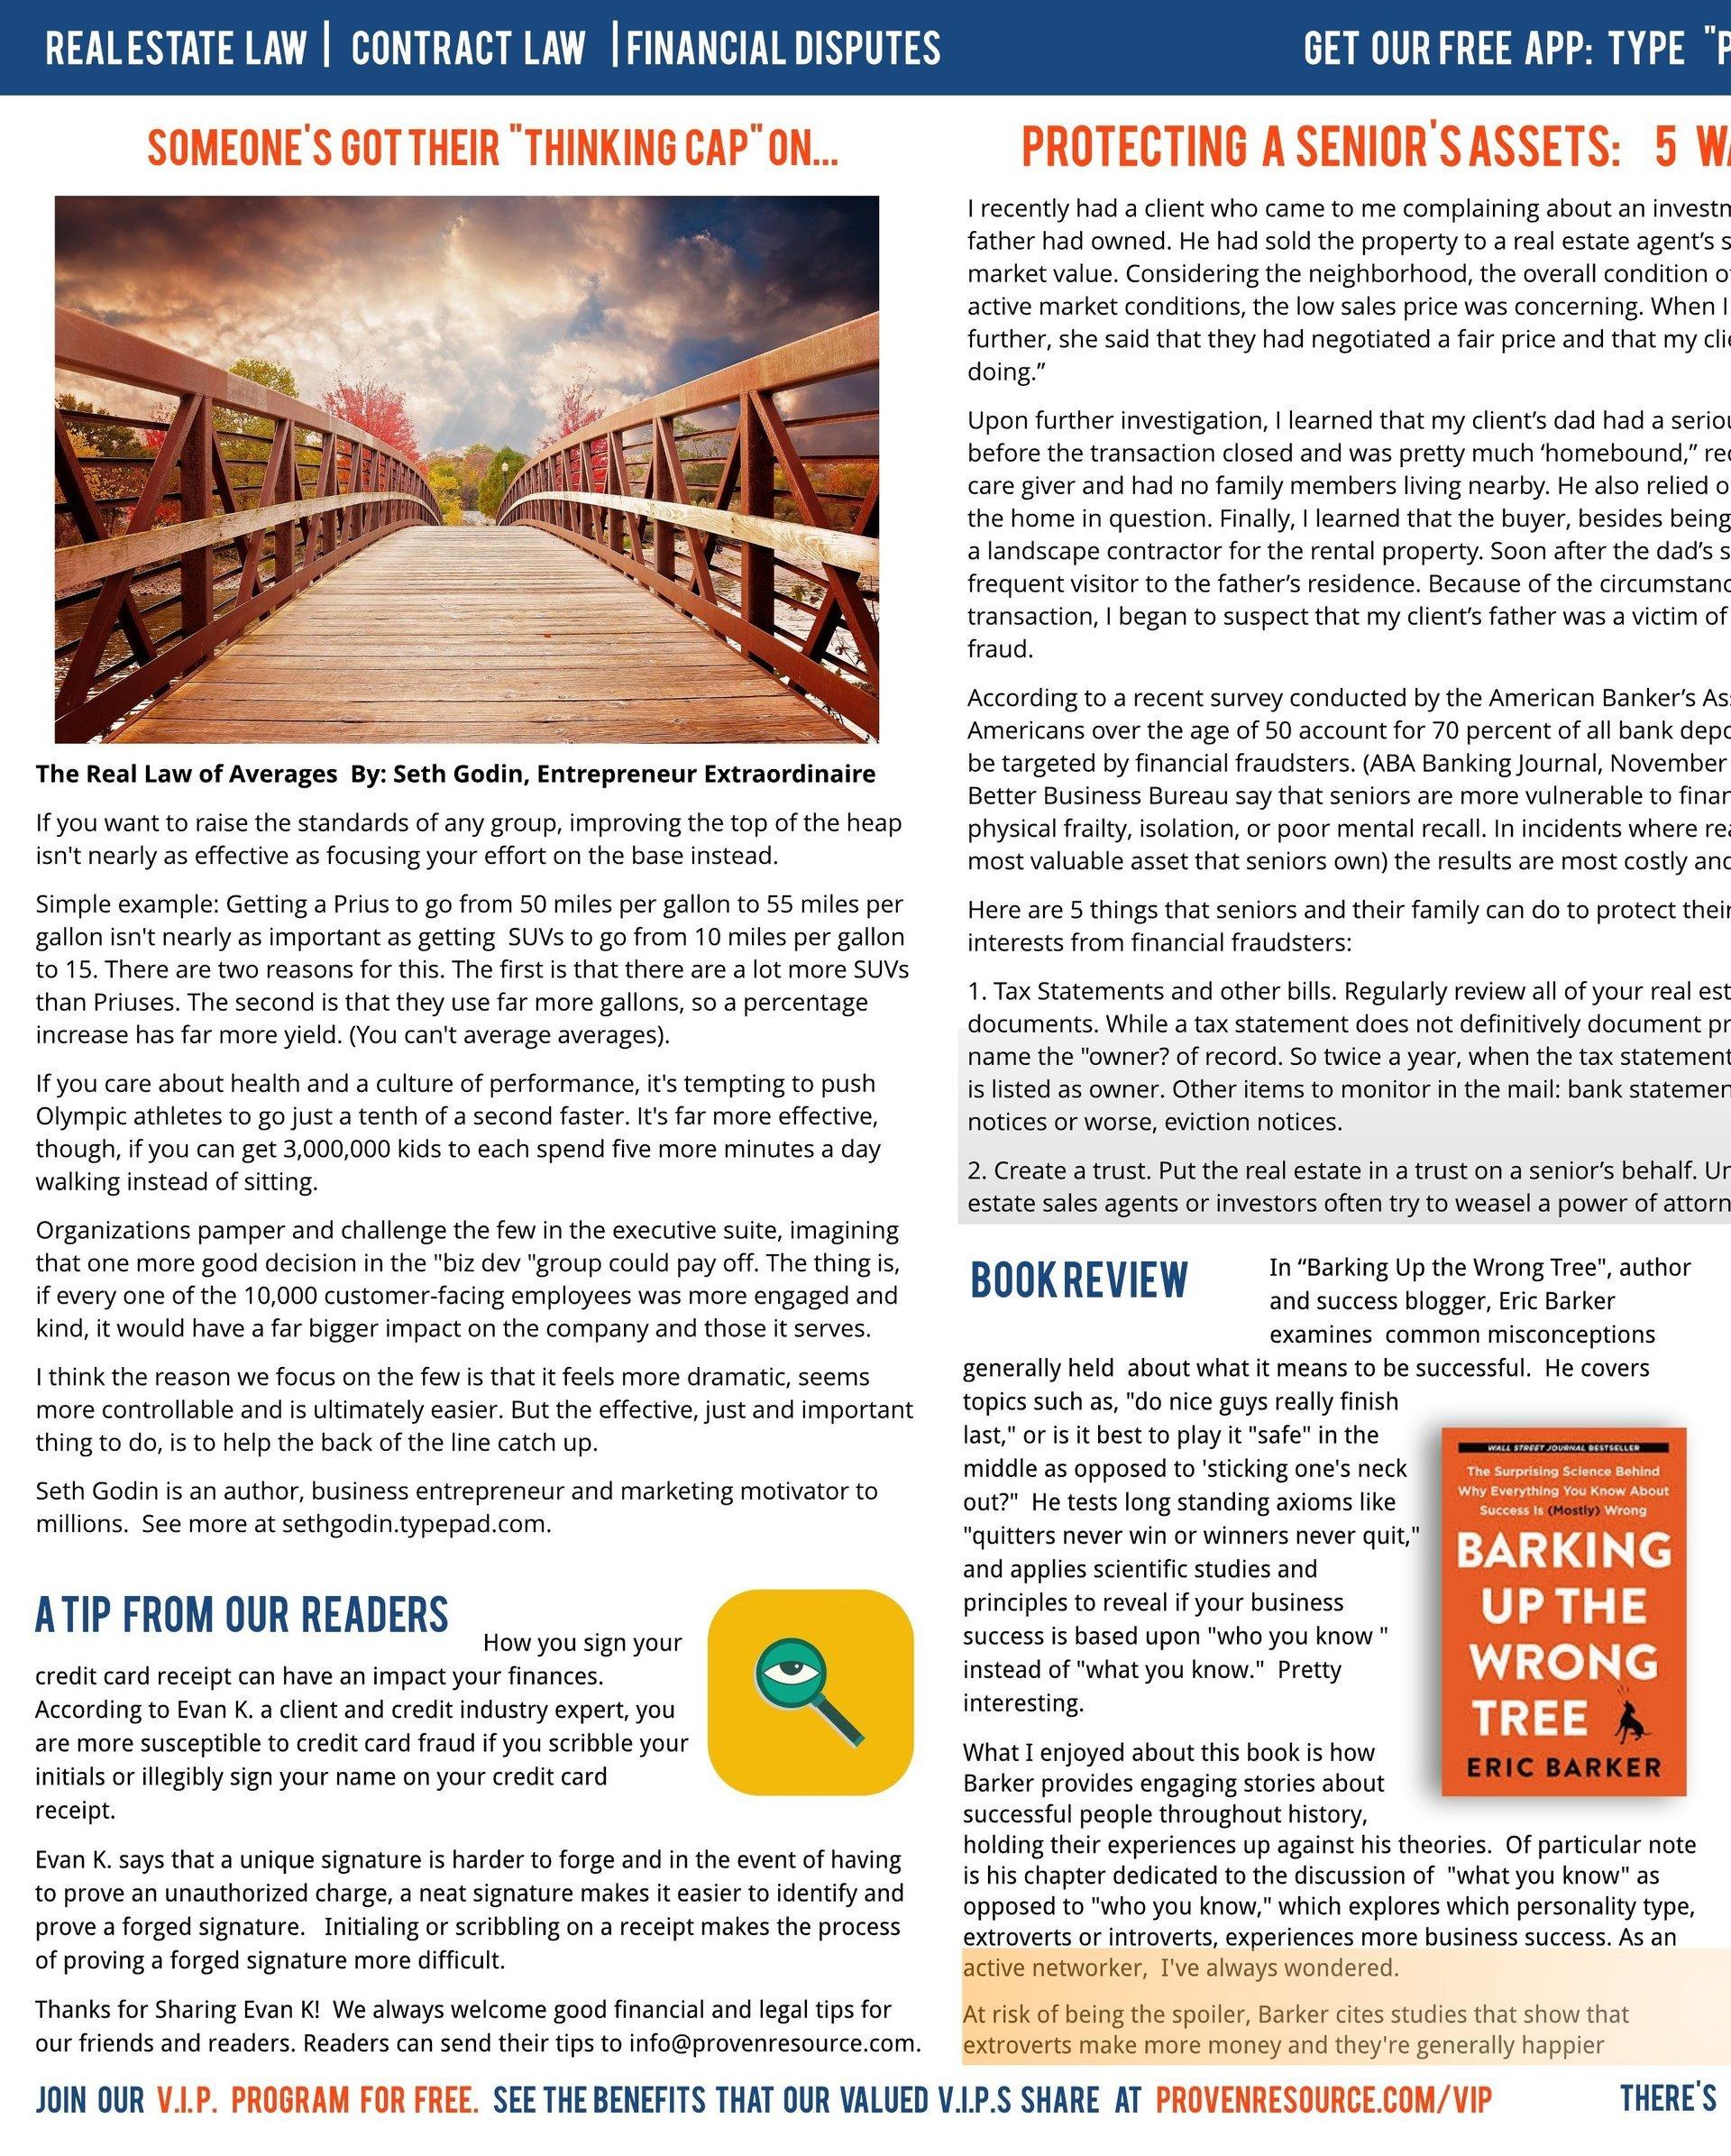 Proven Resource Newsletter Octoberish 2017